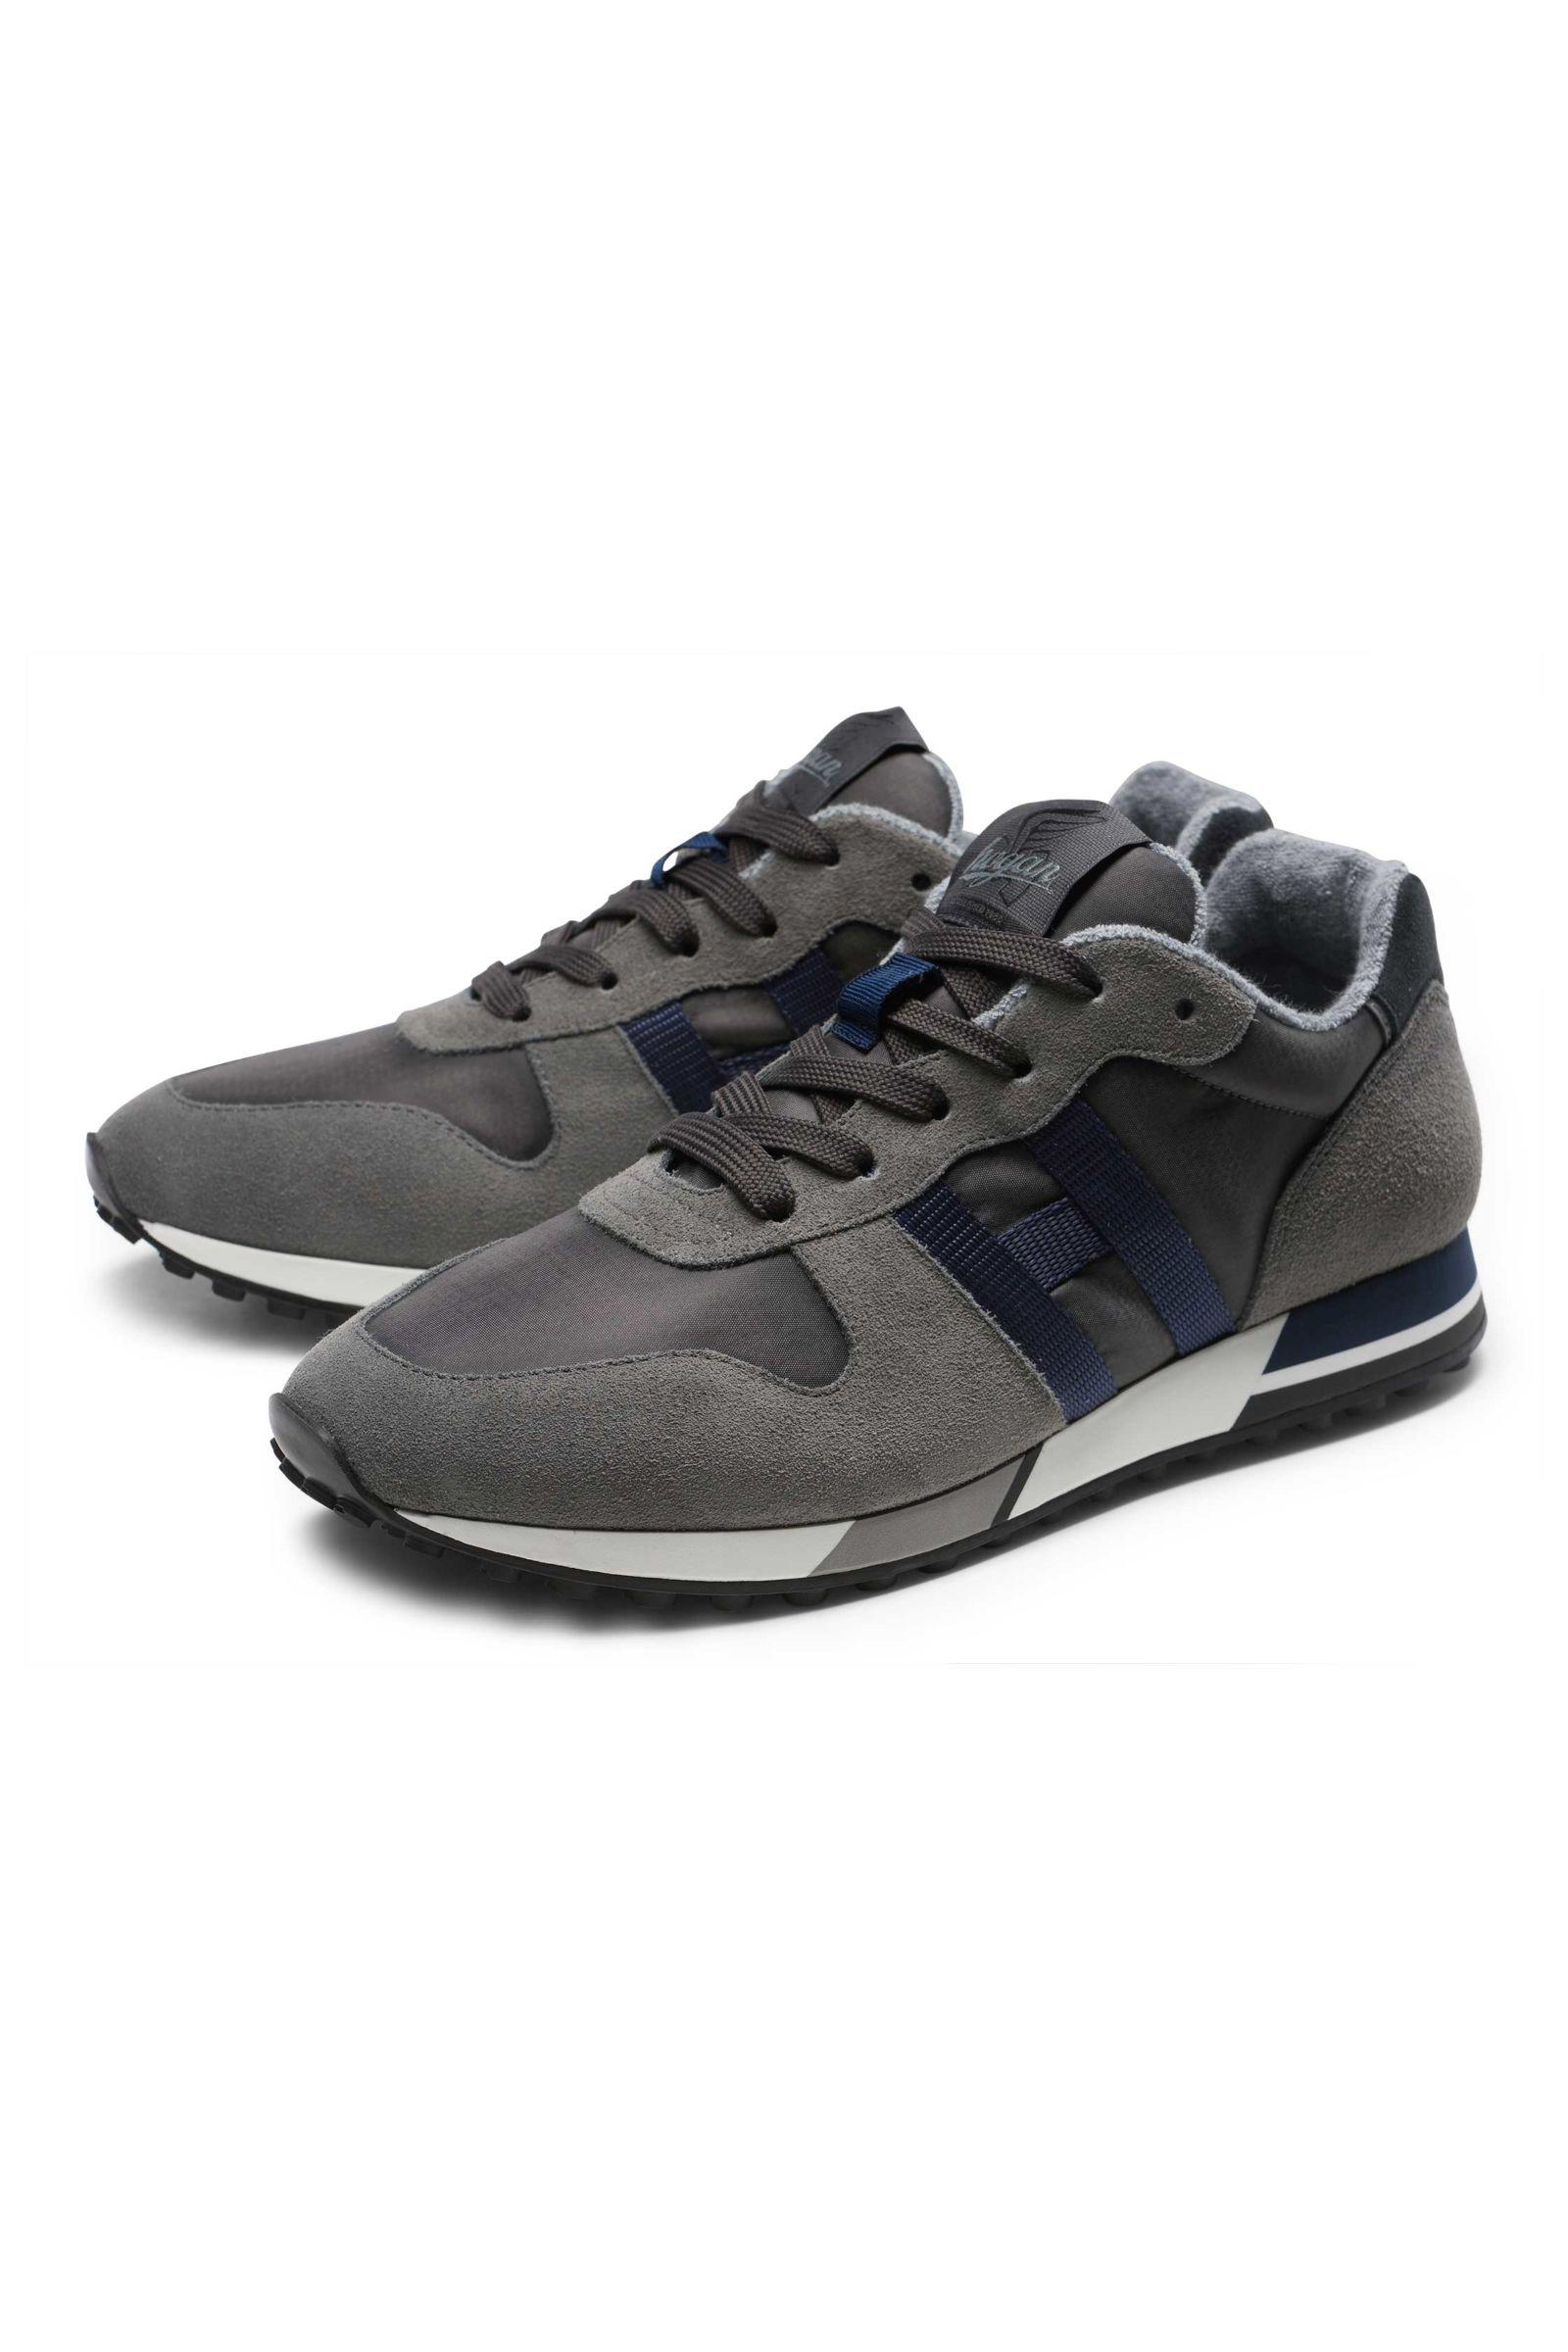 HOGAN sneakers 'H383' grey/navy   BRAUN Hamburg